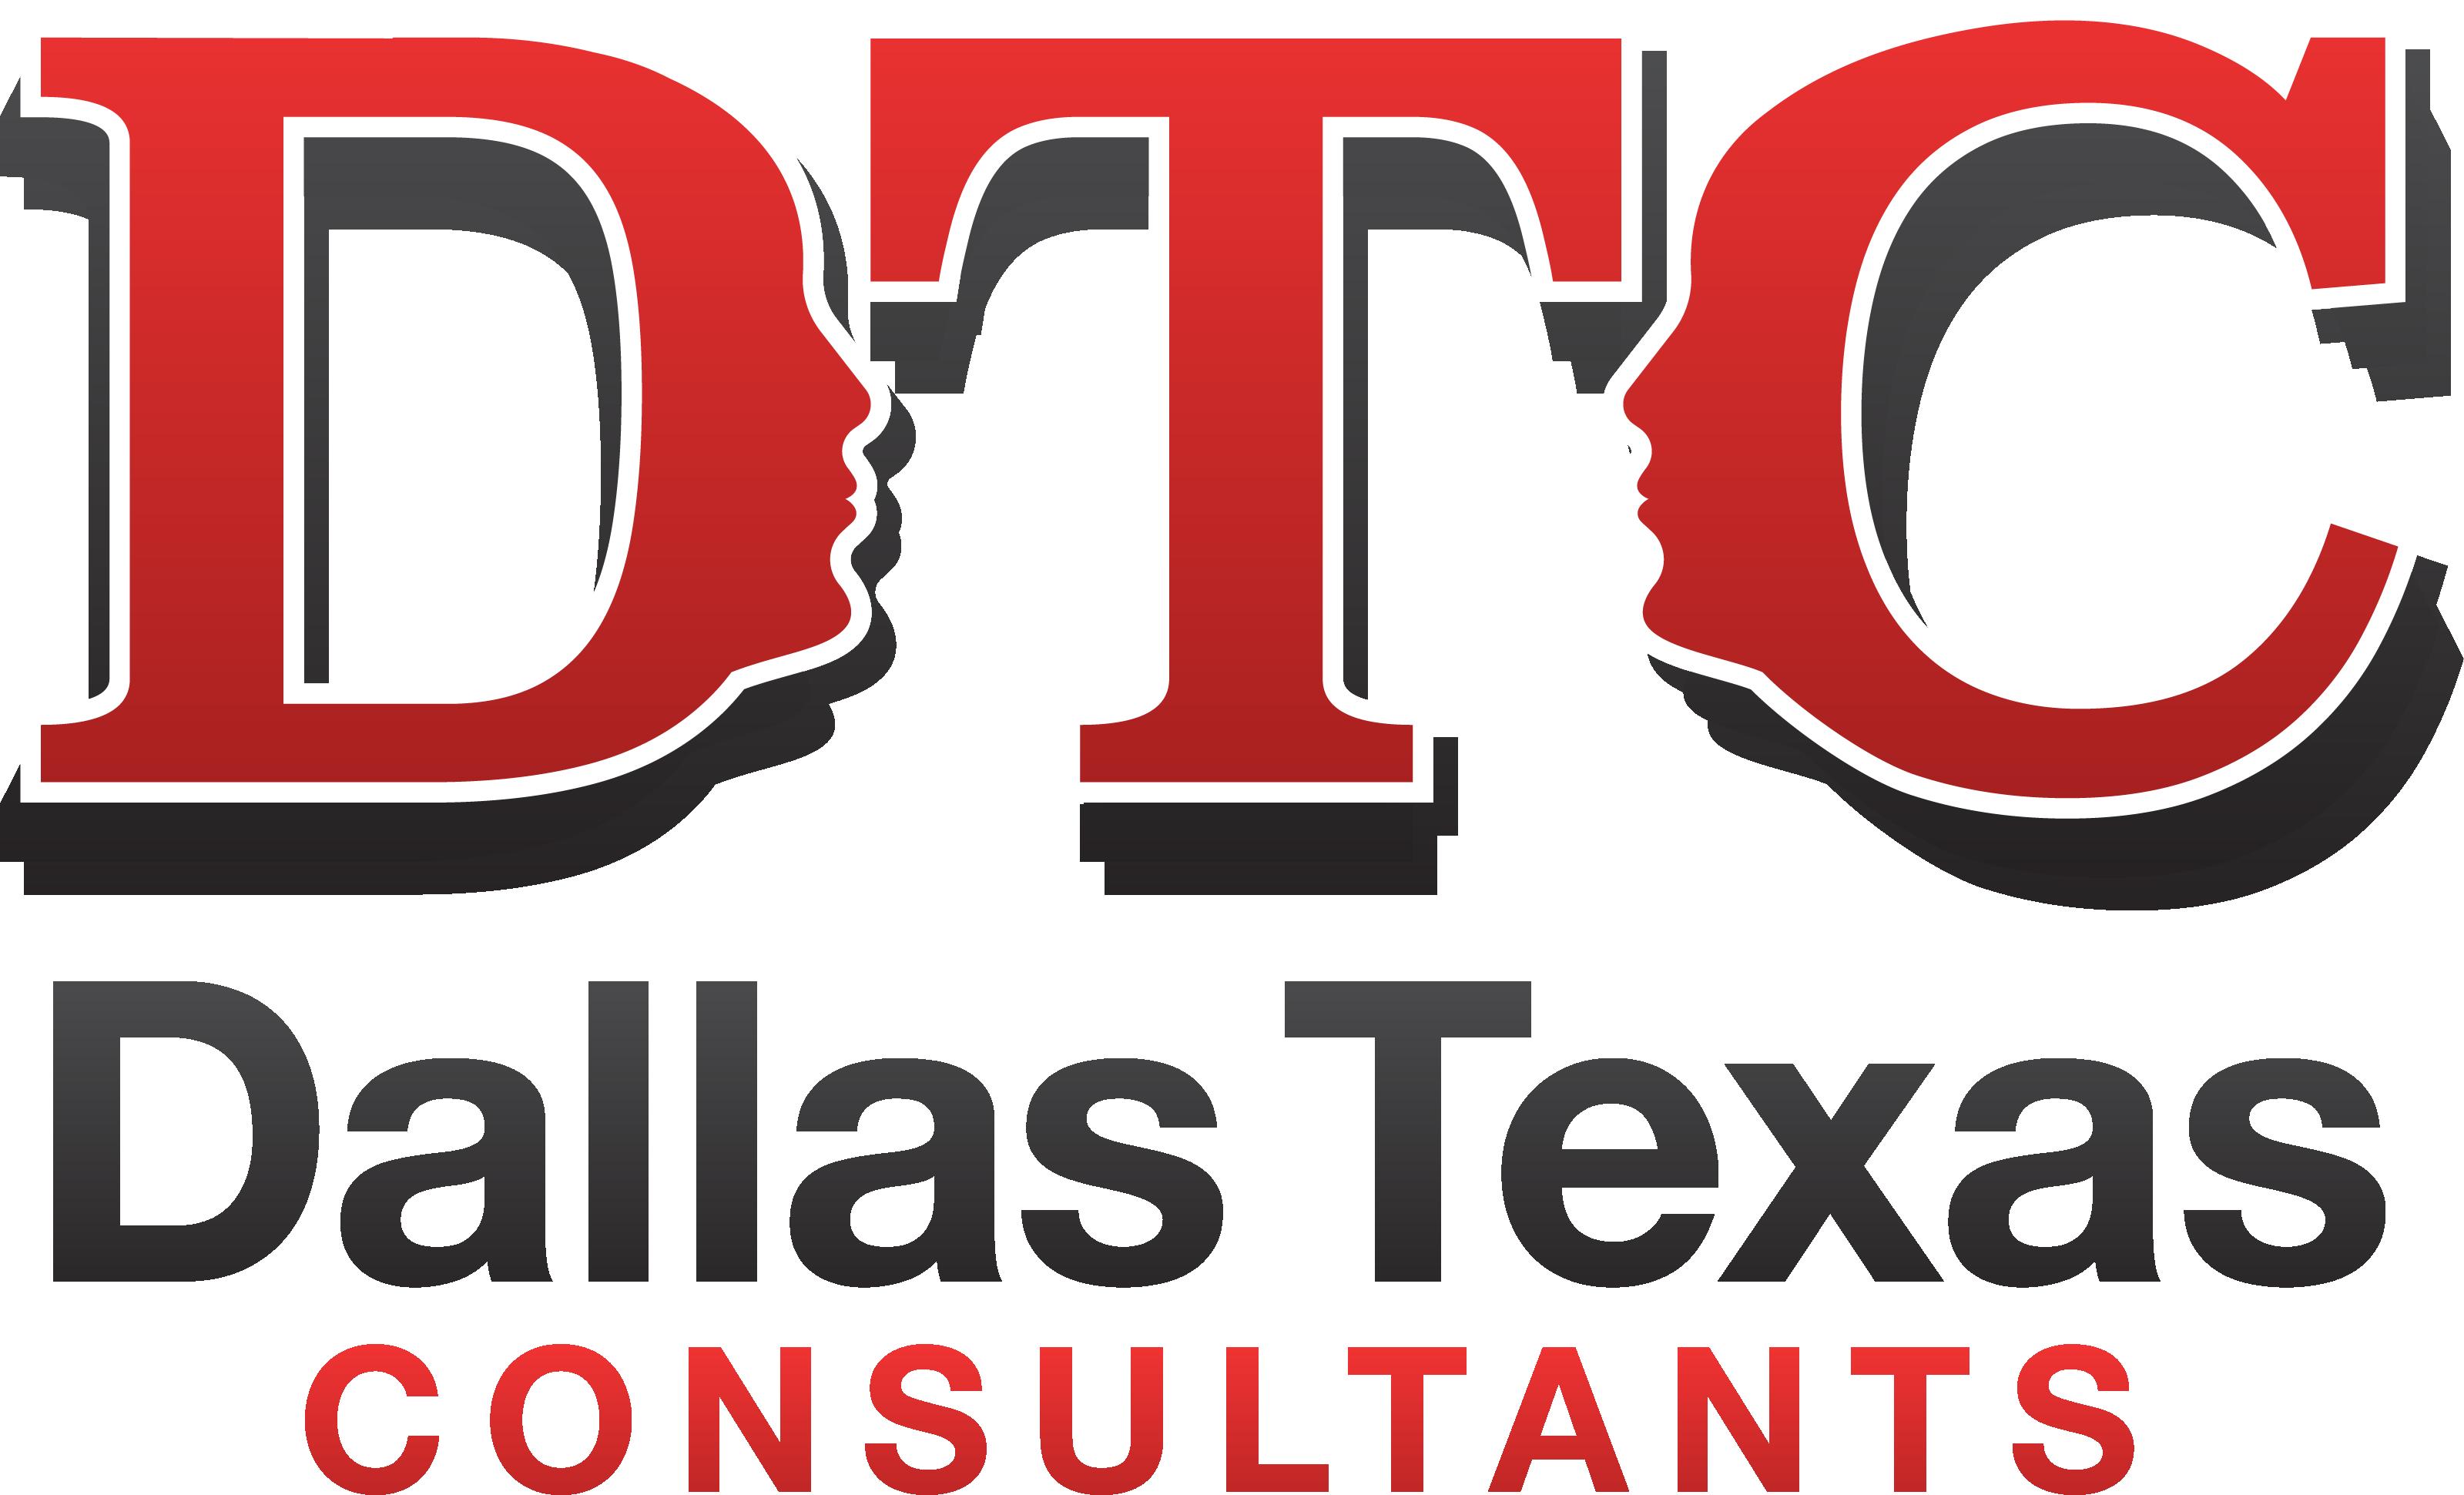 Dallas Texas Consultants, Inc.